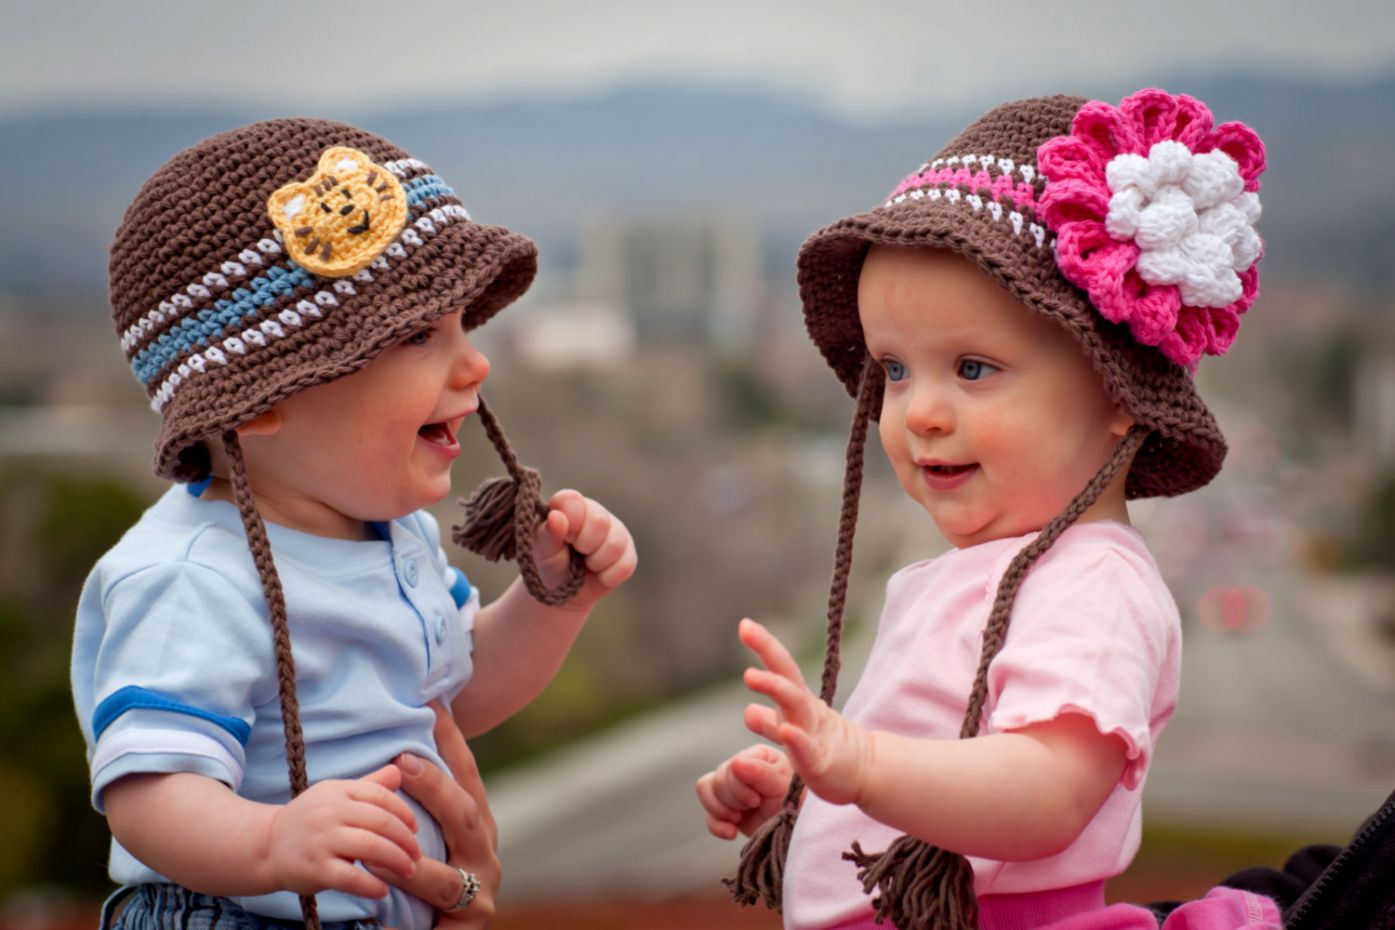 Baby Boy Wallpaper - Cute Baby Boy Girl - HD Wallpaper